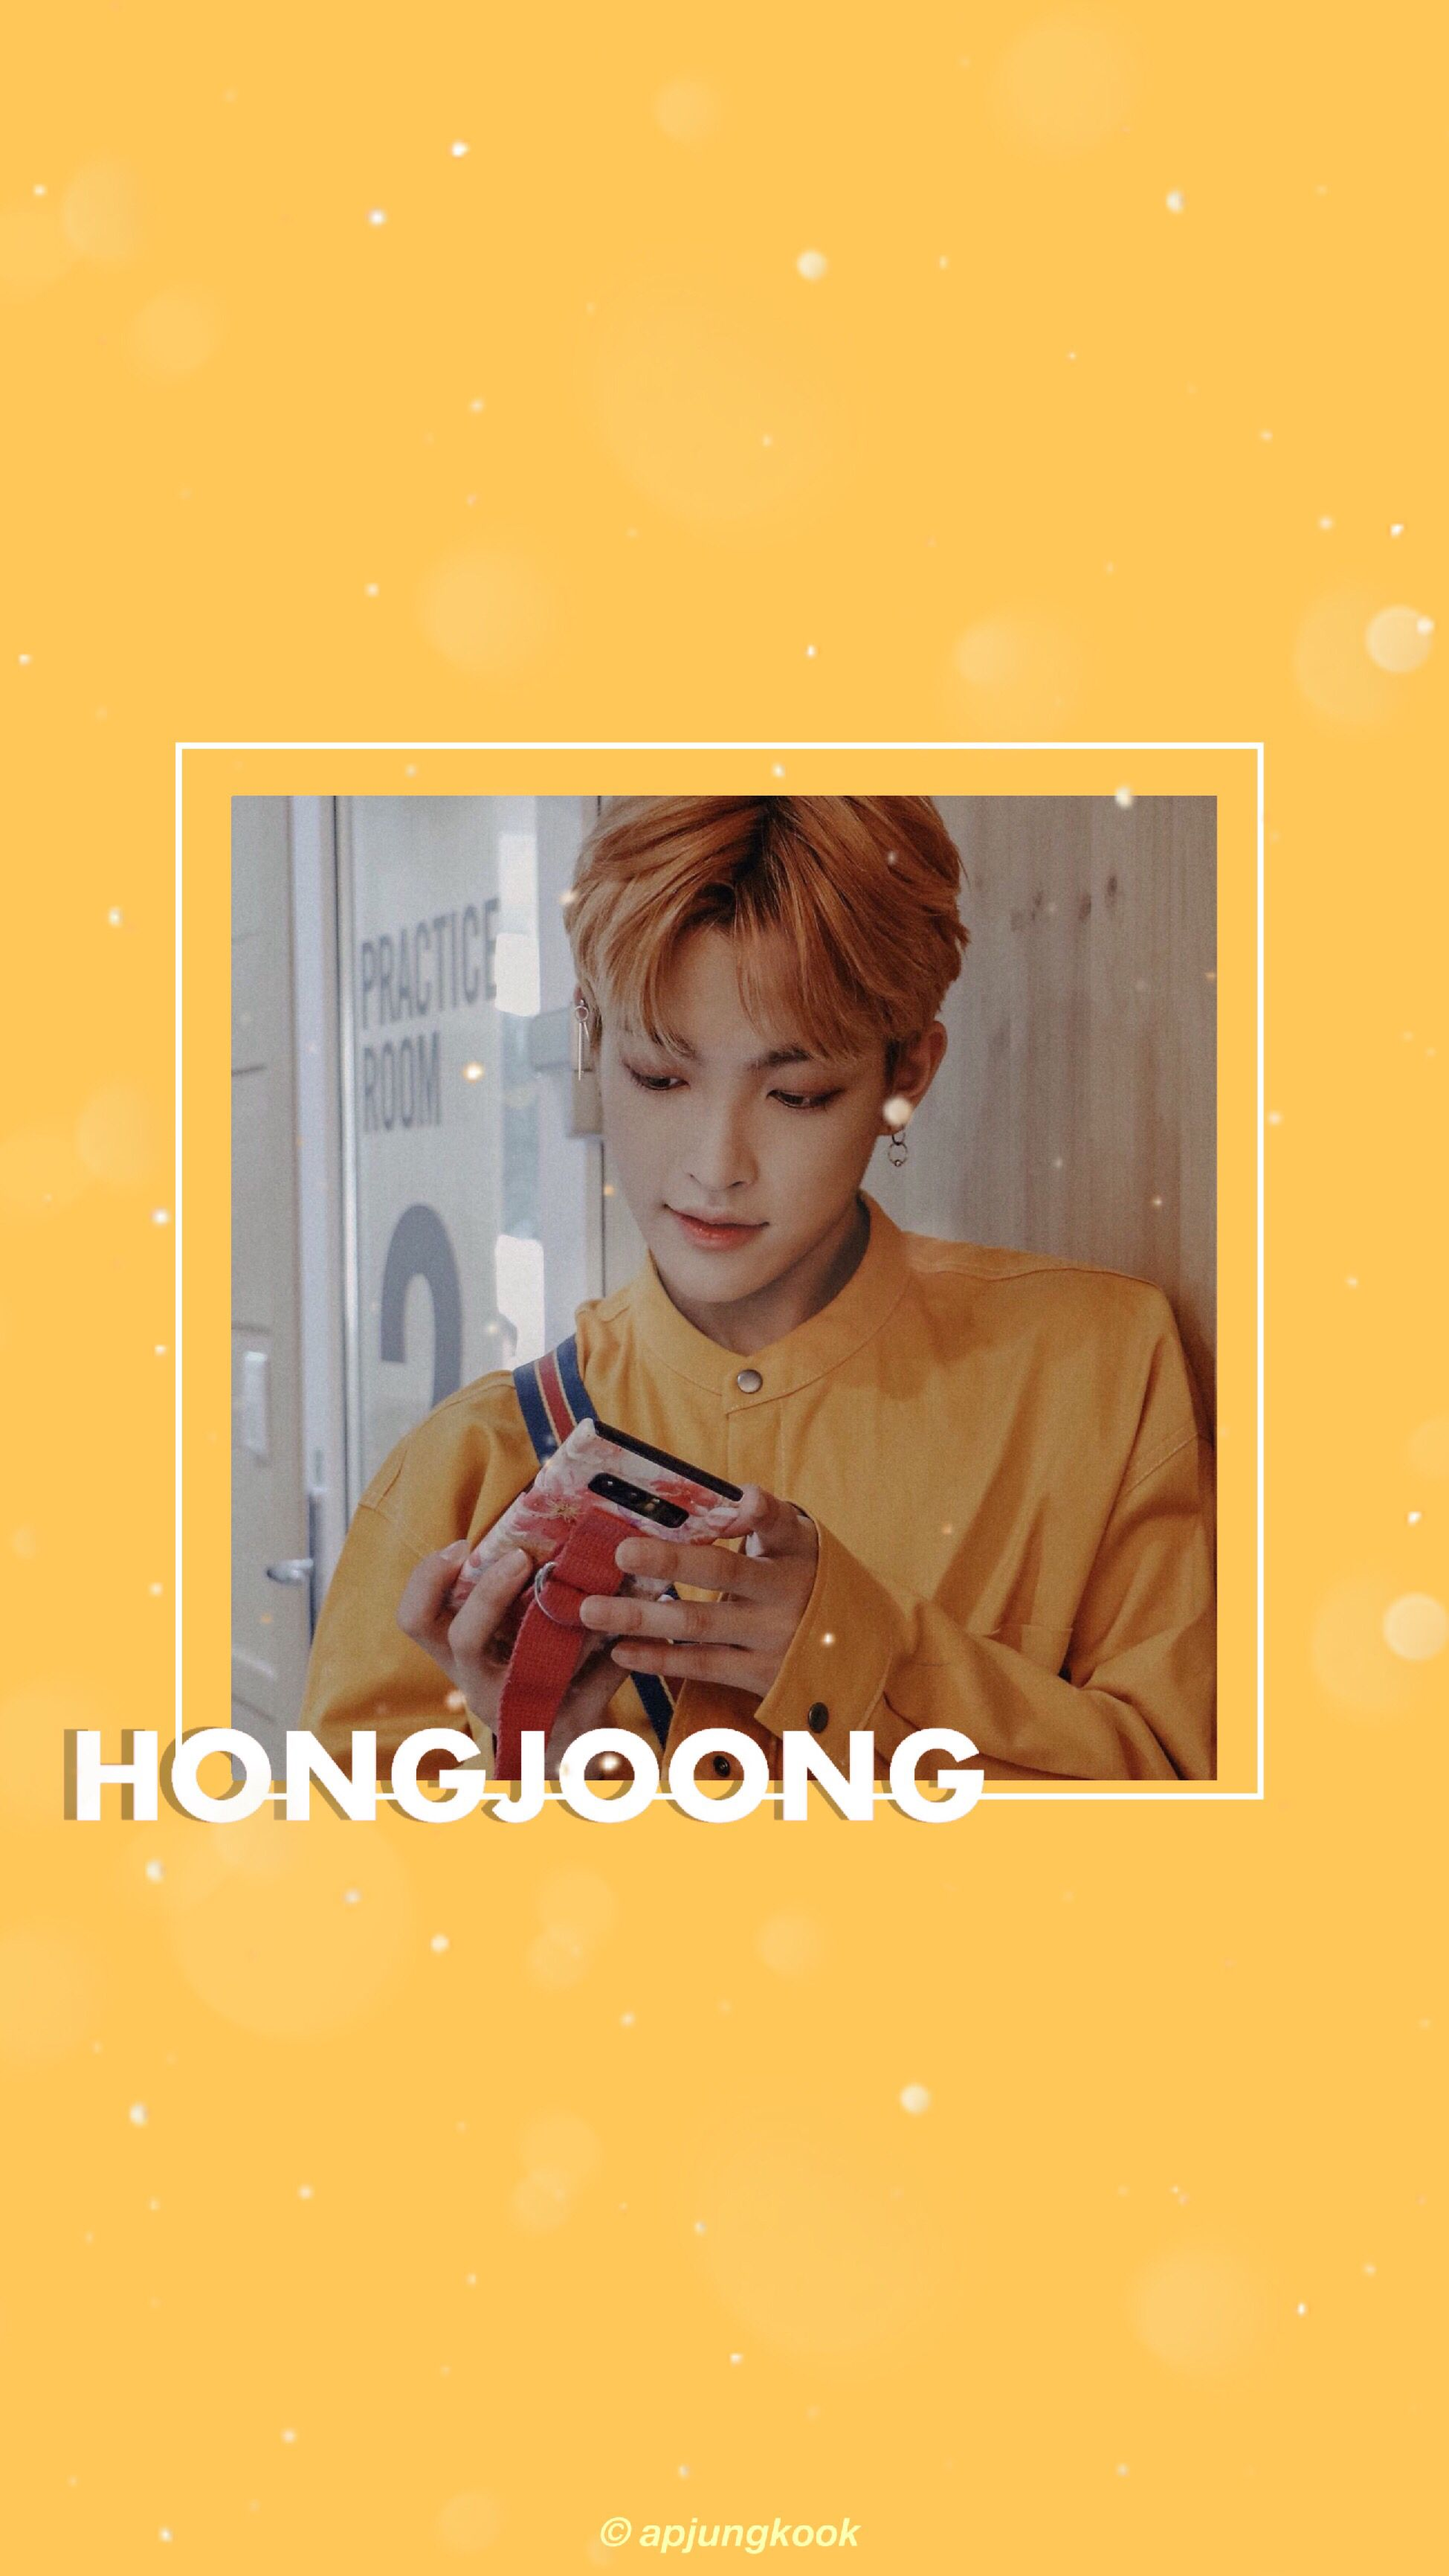 Ateez Hongjoong Wallpapers Top Free Ateez Hongjoong Backgrounds Wallpaperaccess